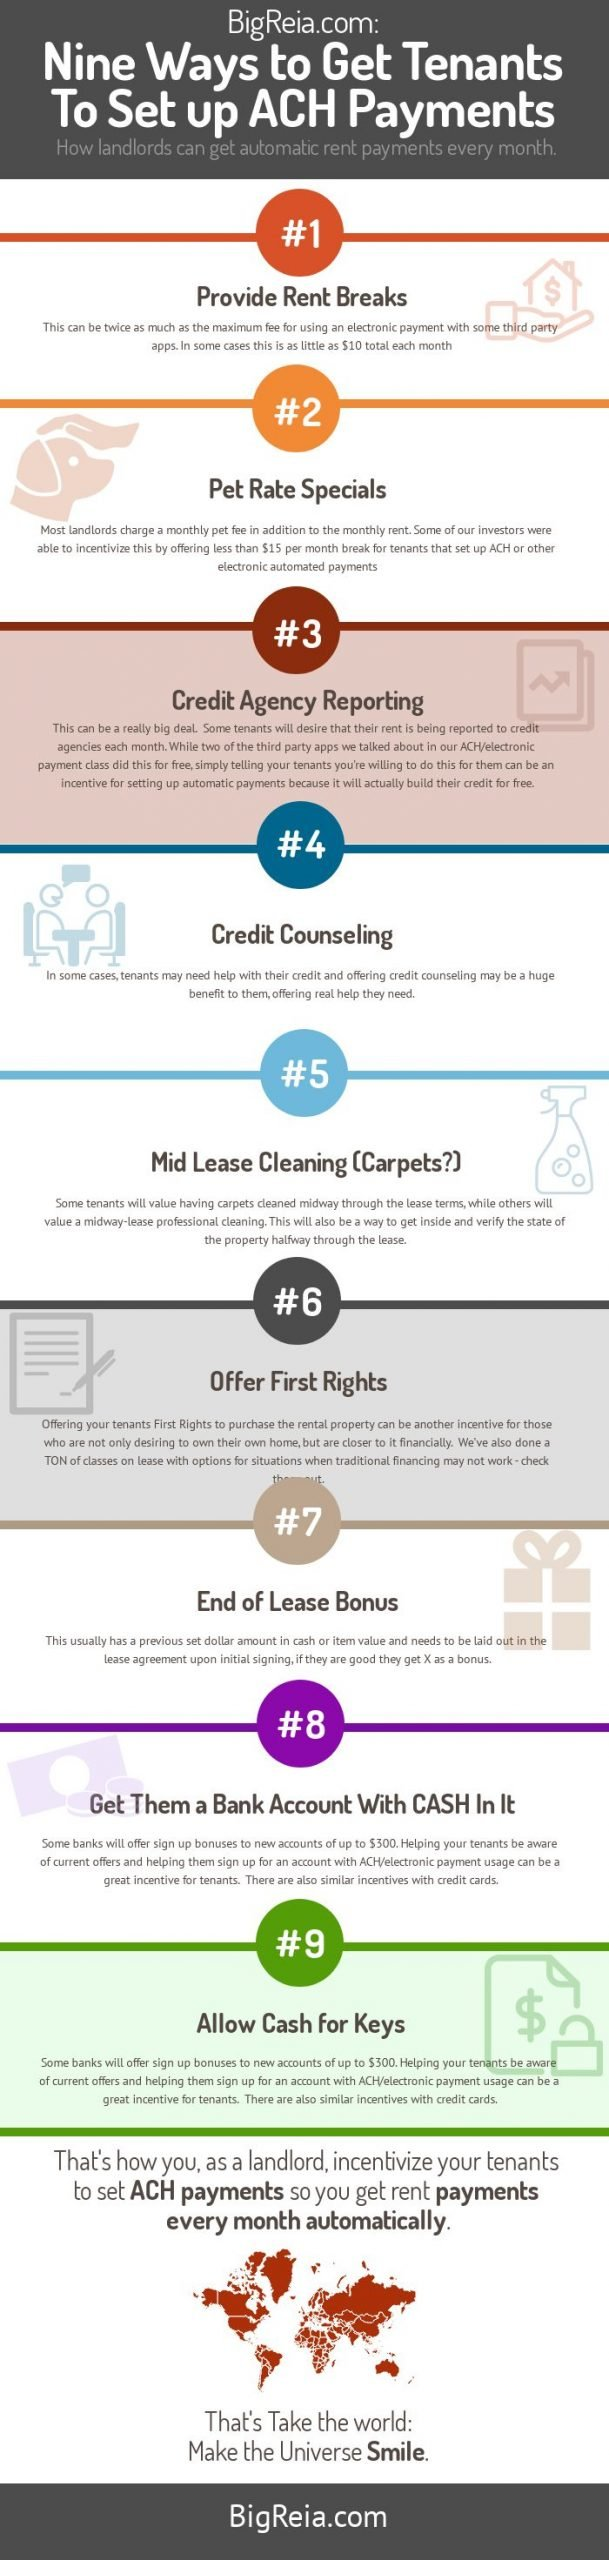 BigReia how landlords get tenants to do ACH